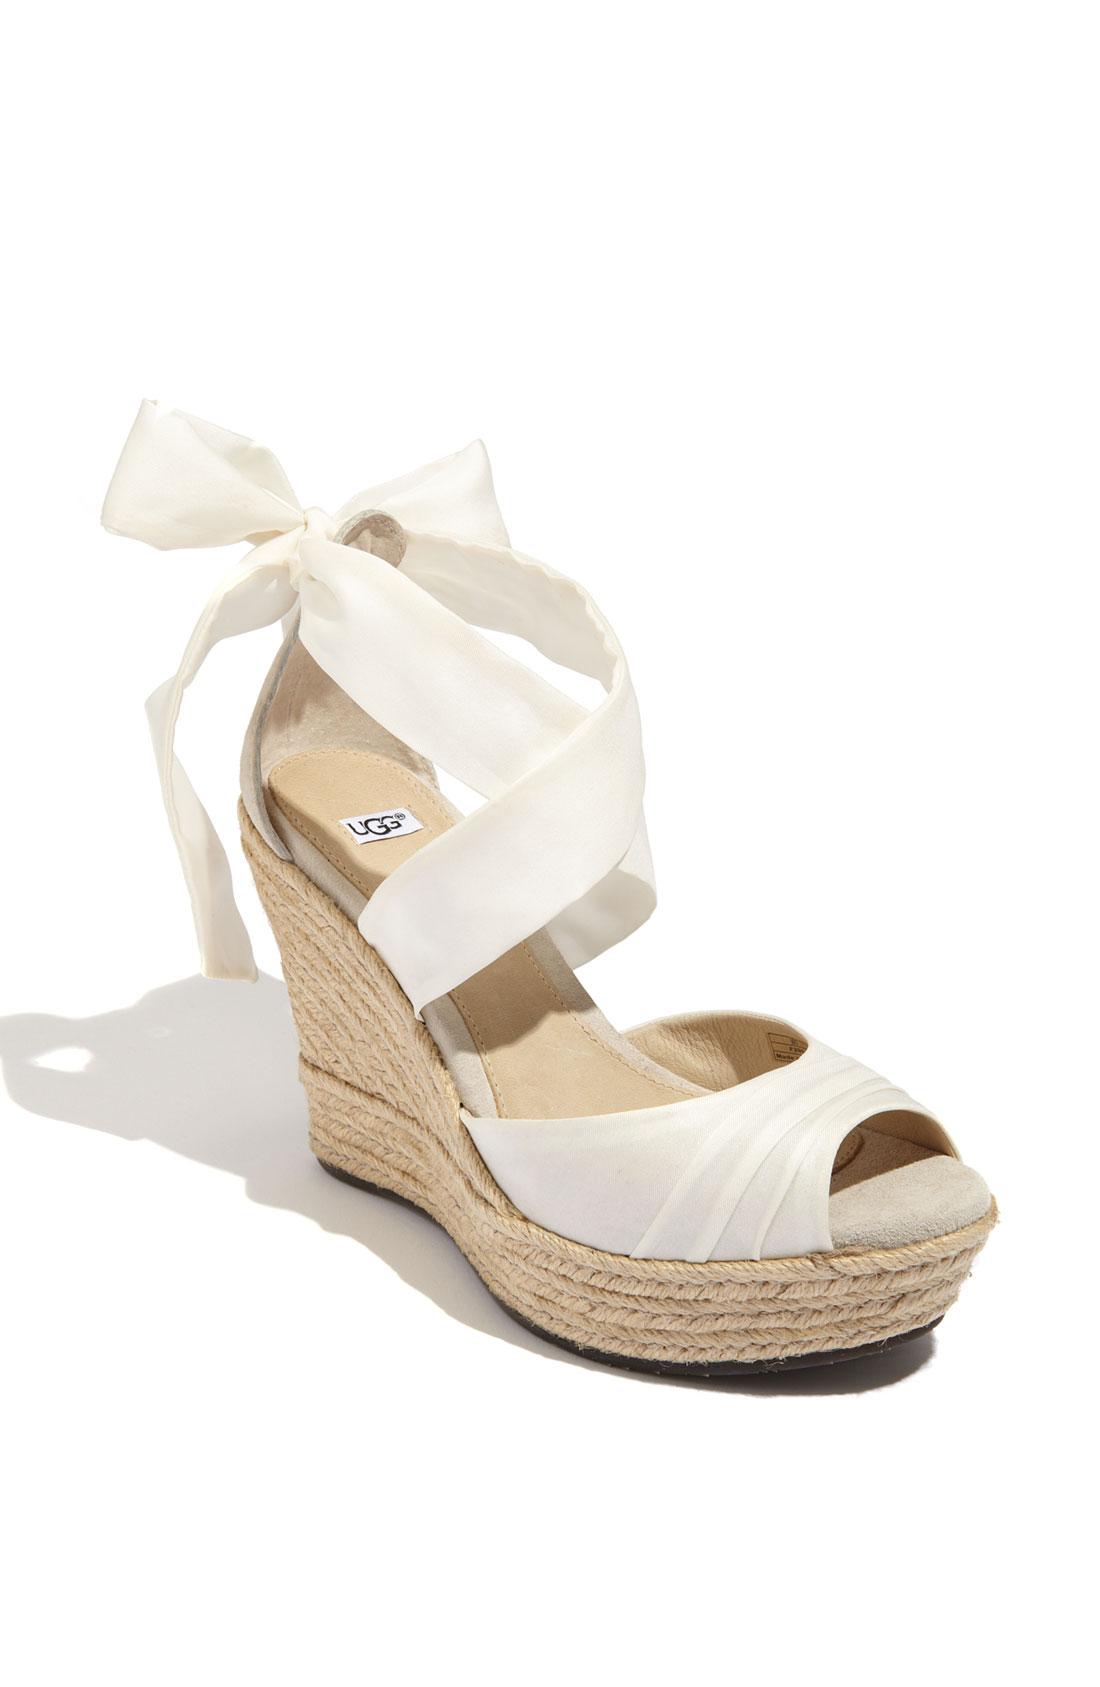 Ugg Sandals Lucianna Wrap In White White Silk Lyst